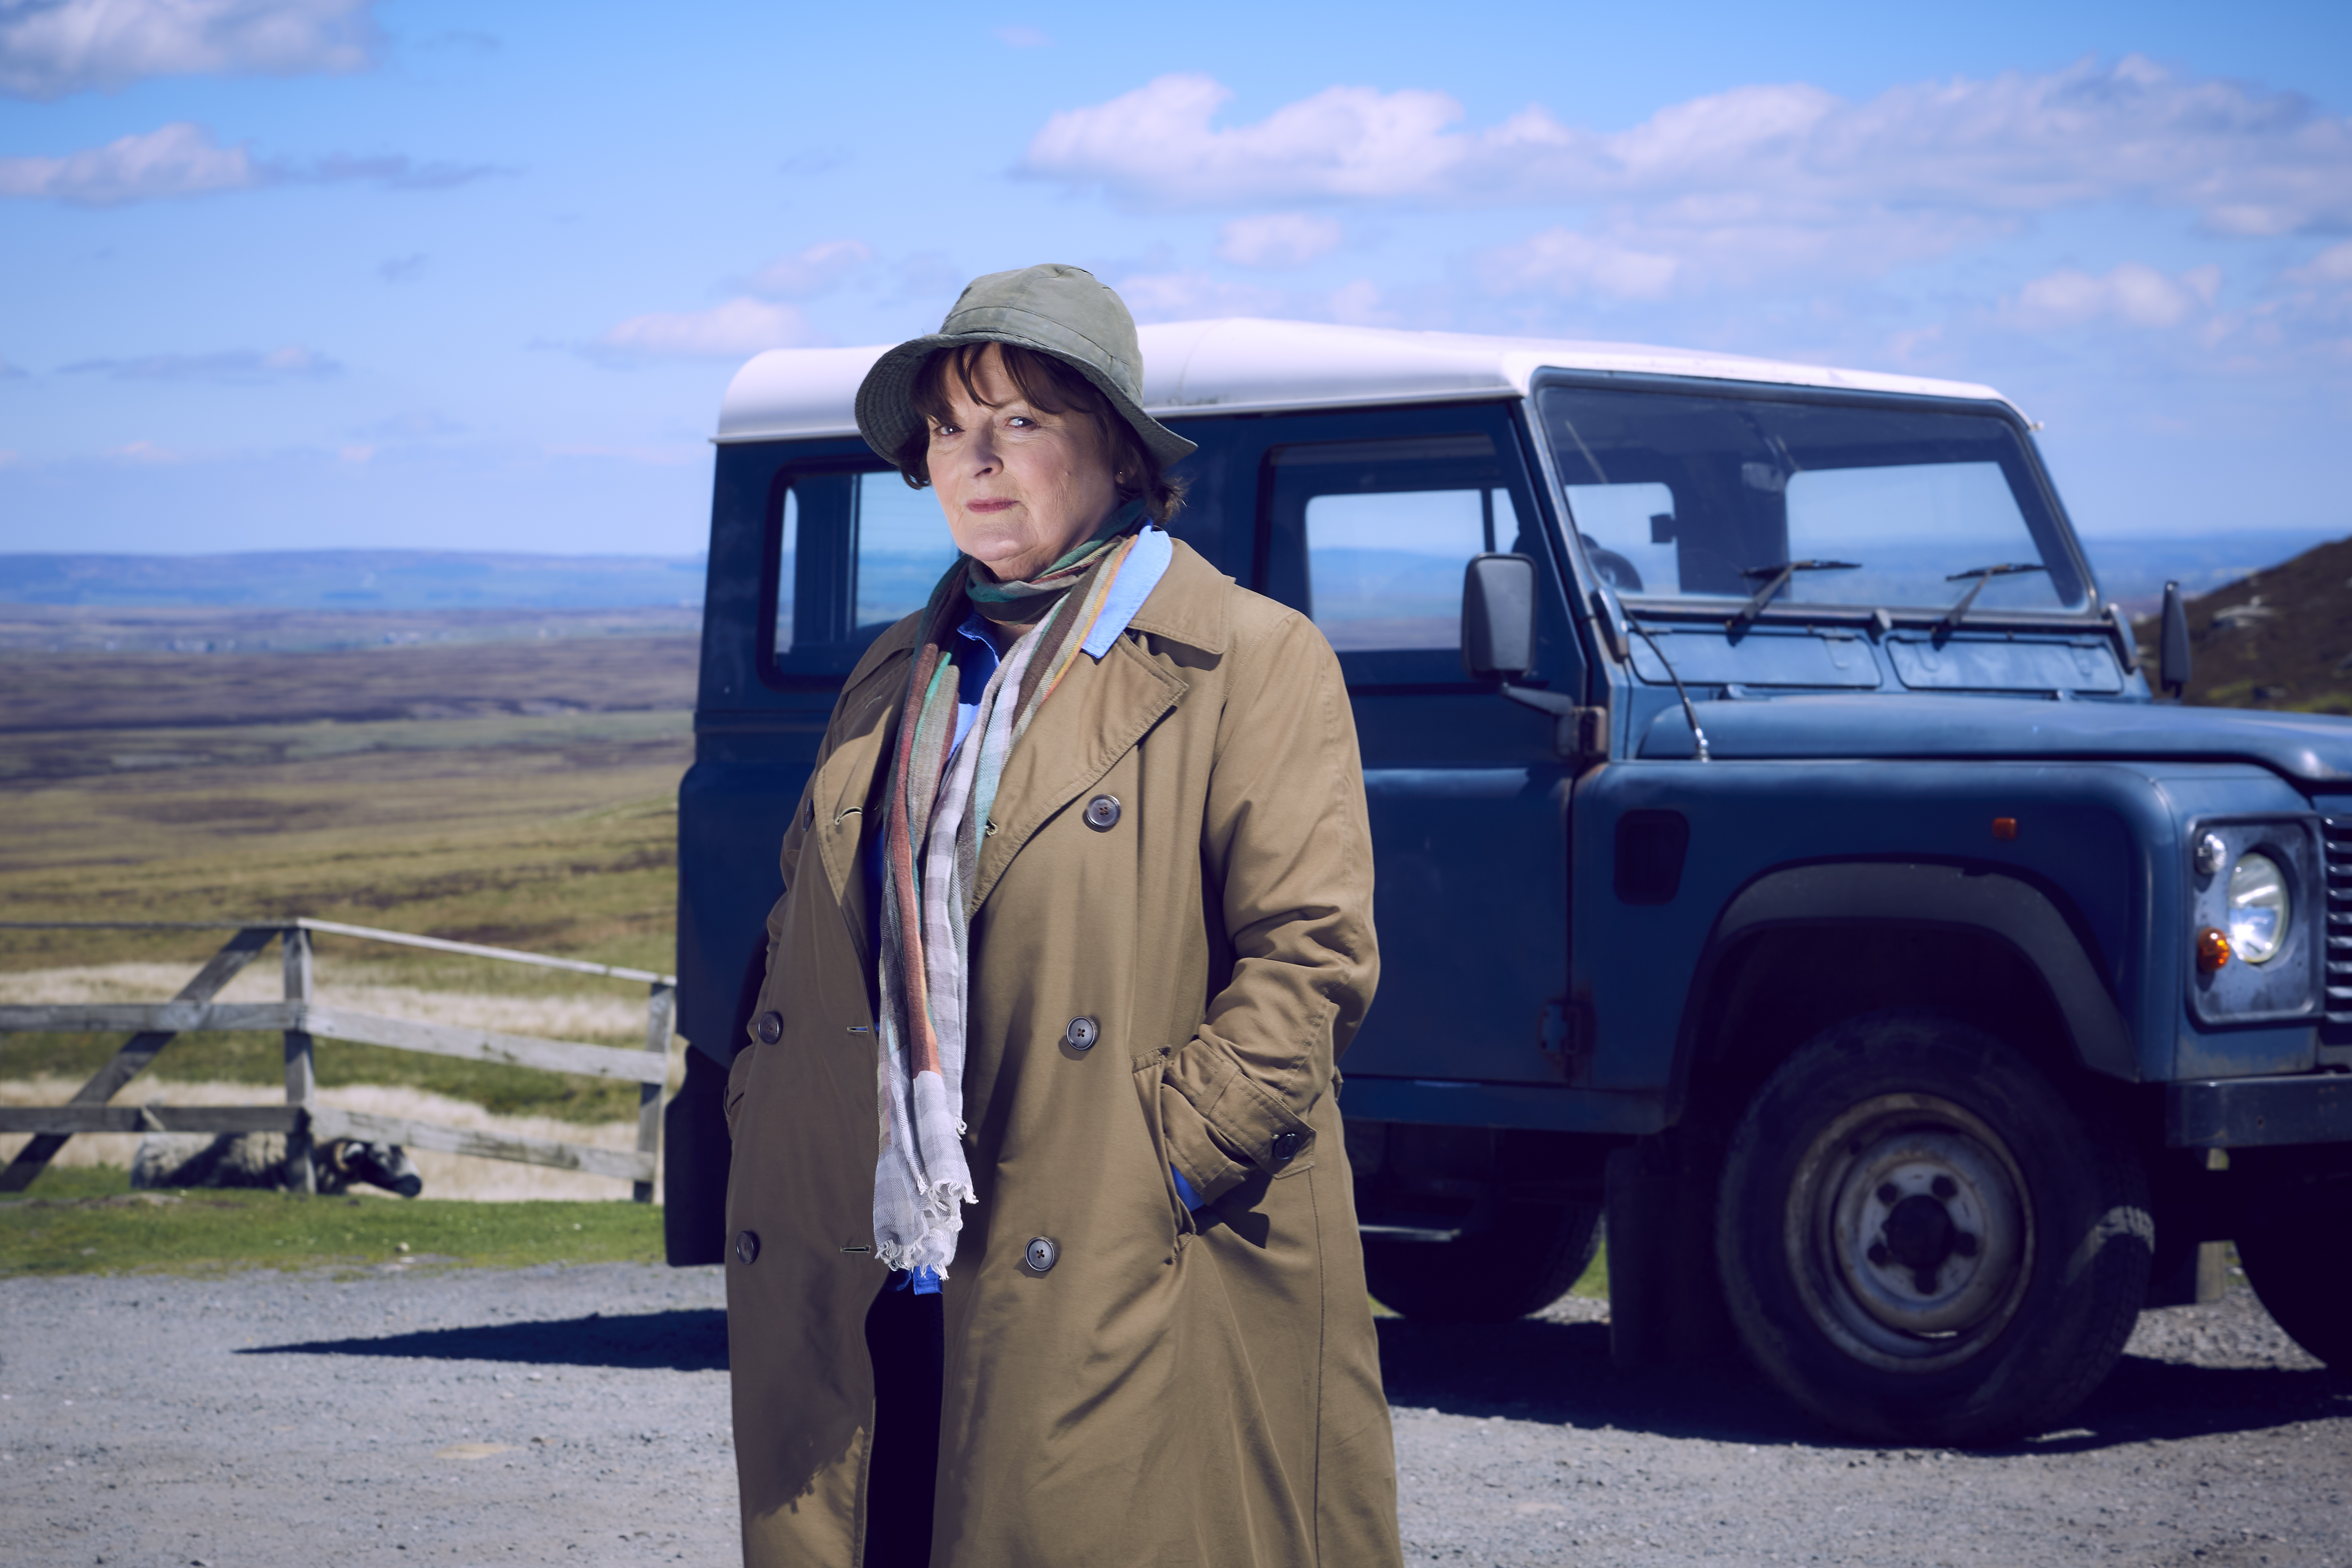 Brenda Blethyn as Vera in series 10 of the ITV drama